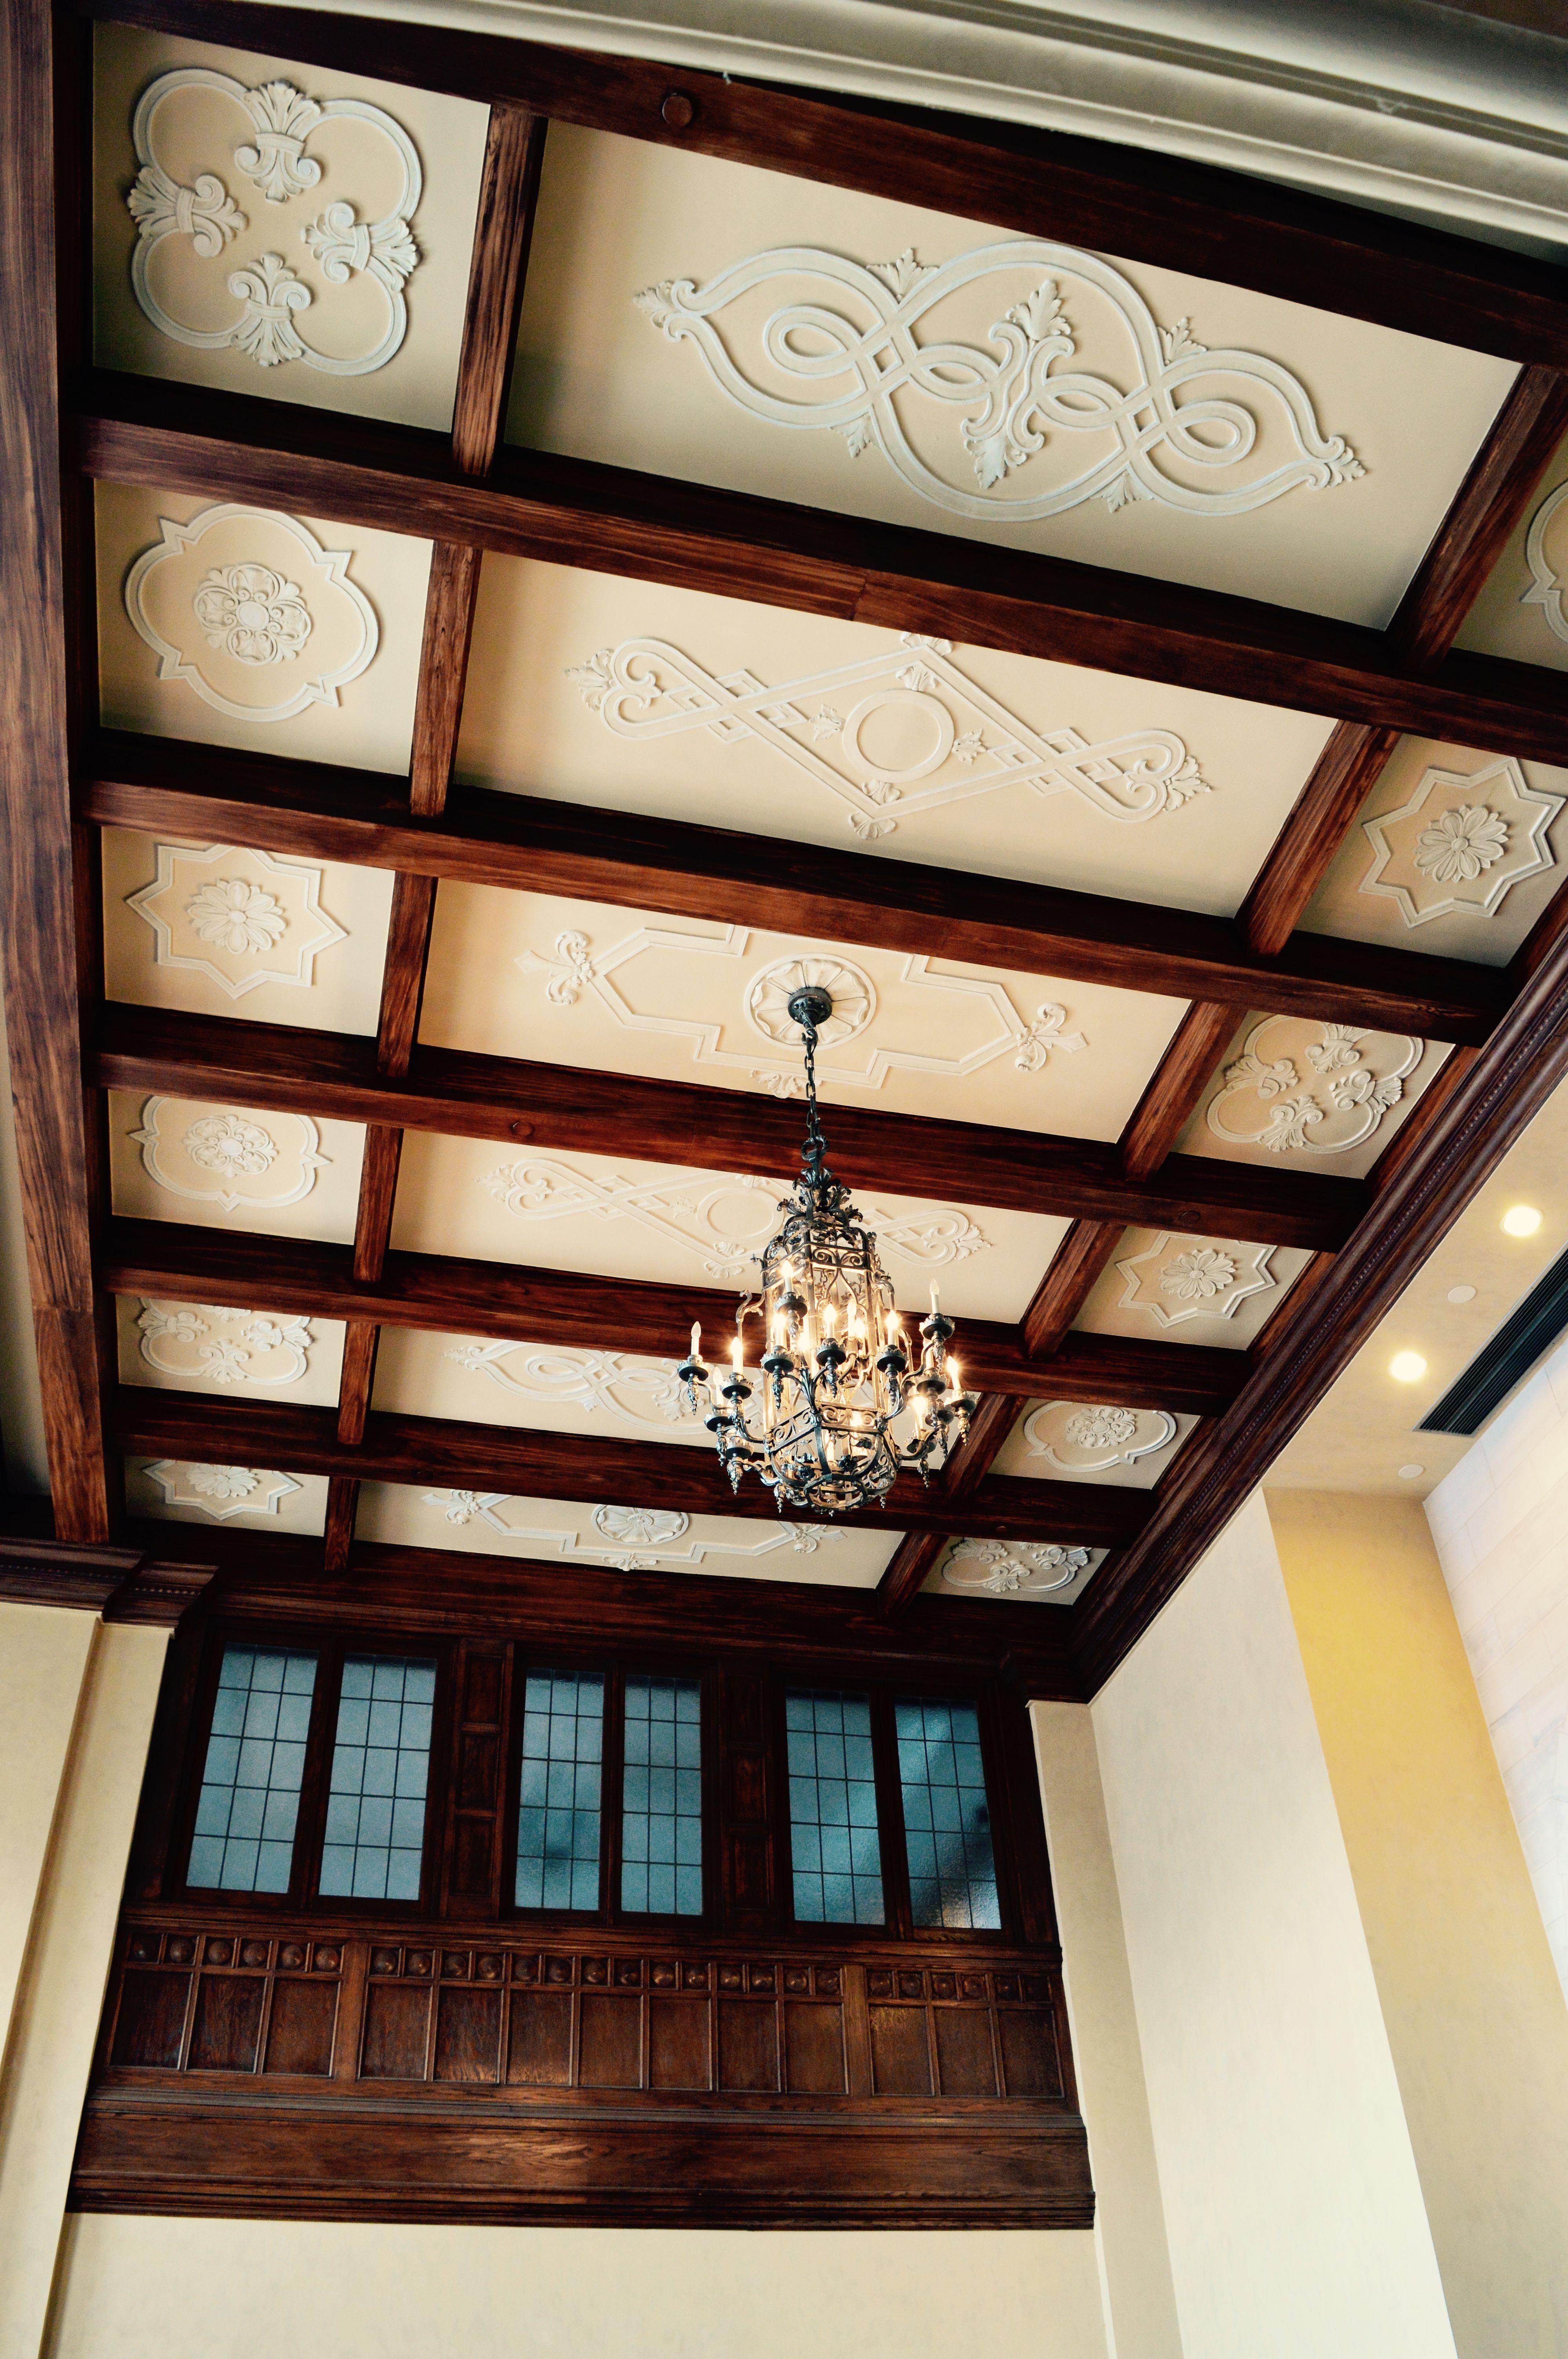 Inspired Interiors Fairmont Hotel Macdonald Candace Wolfe Design